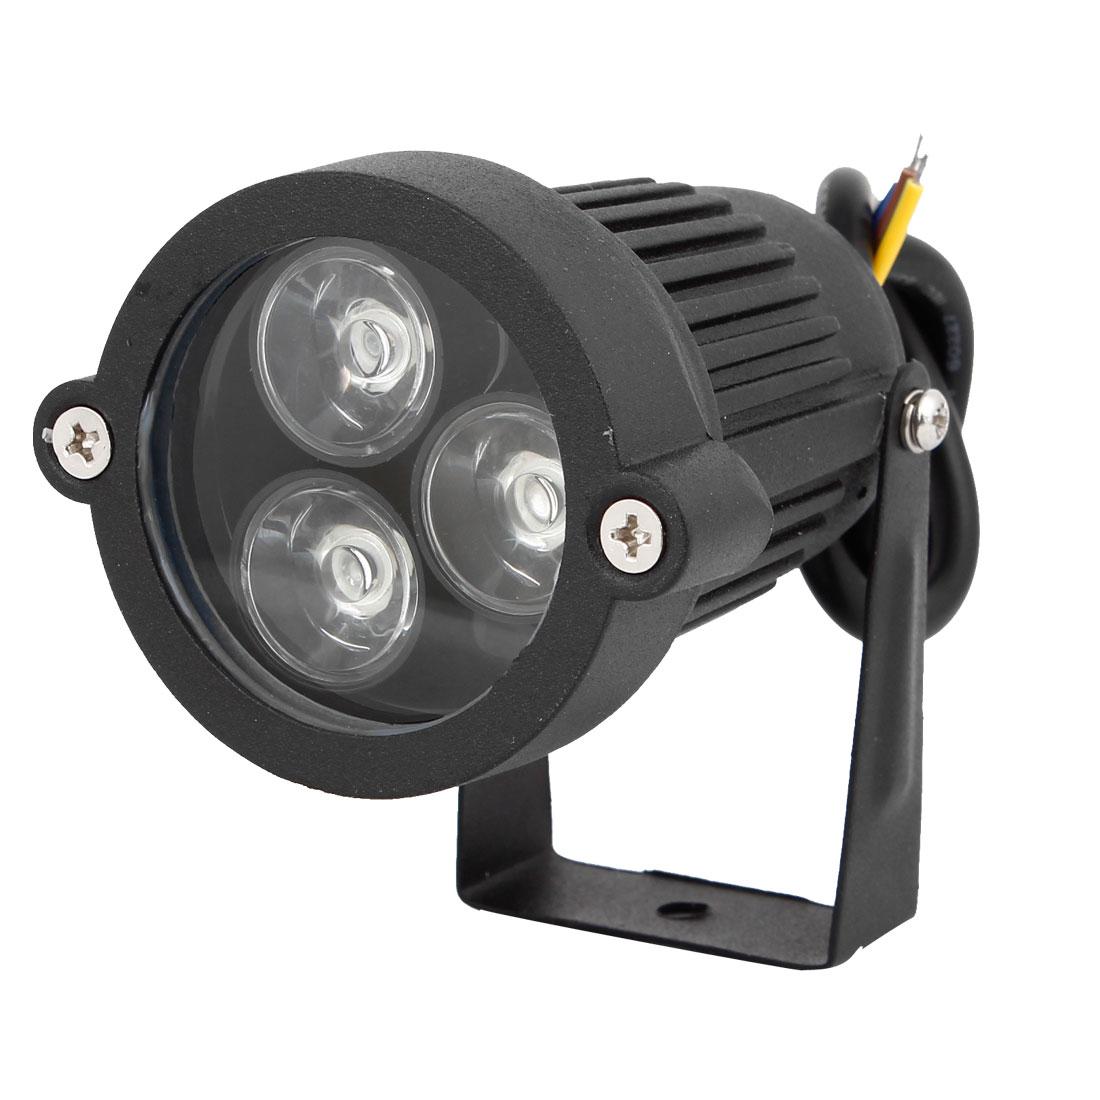 AC85-265V 6W 300-330LM Blue LED Light Landscape Garden Spotlight Lamp